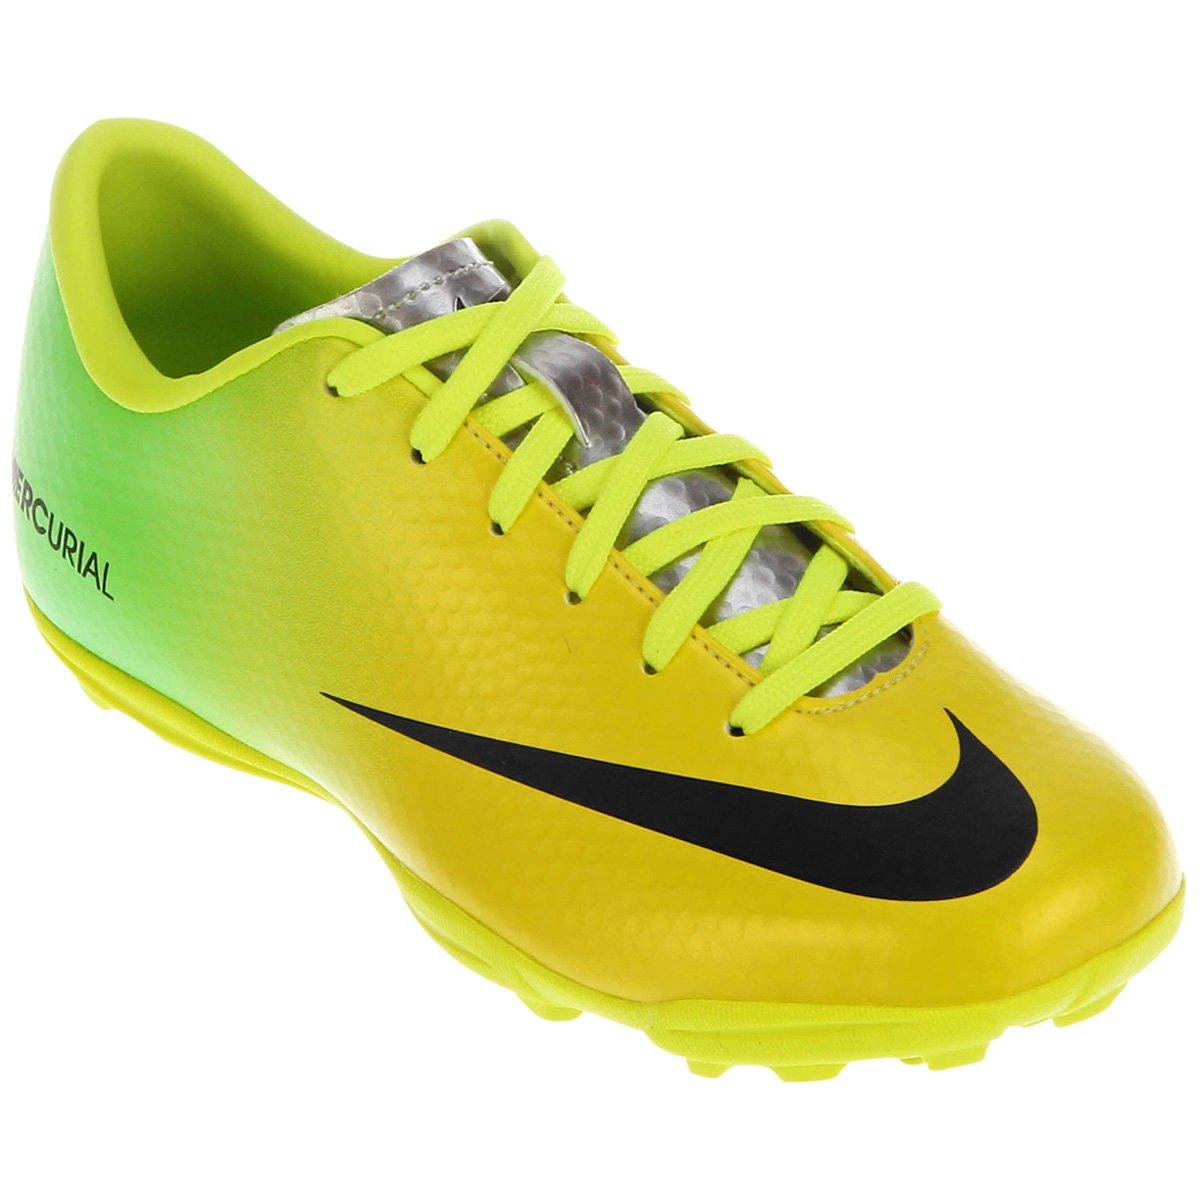 Chuteira Nike Mercurial Victory IV TF Infantil - Compre Agora  d209373fc4abb